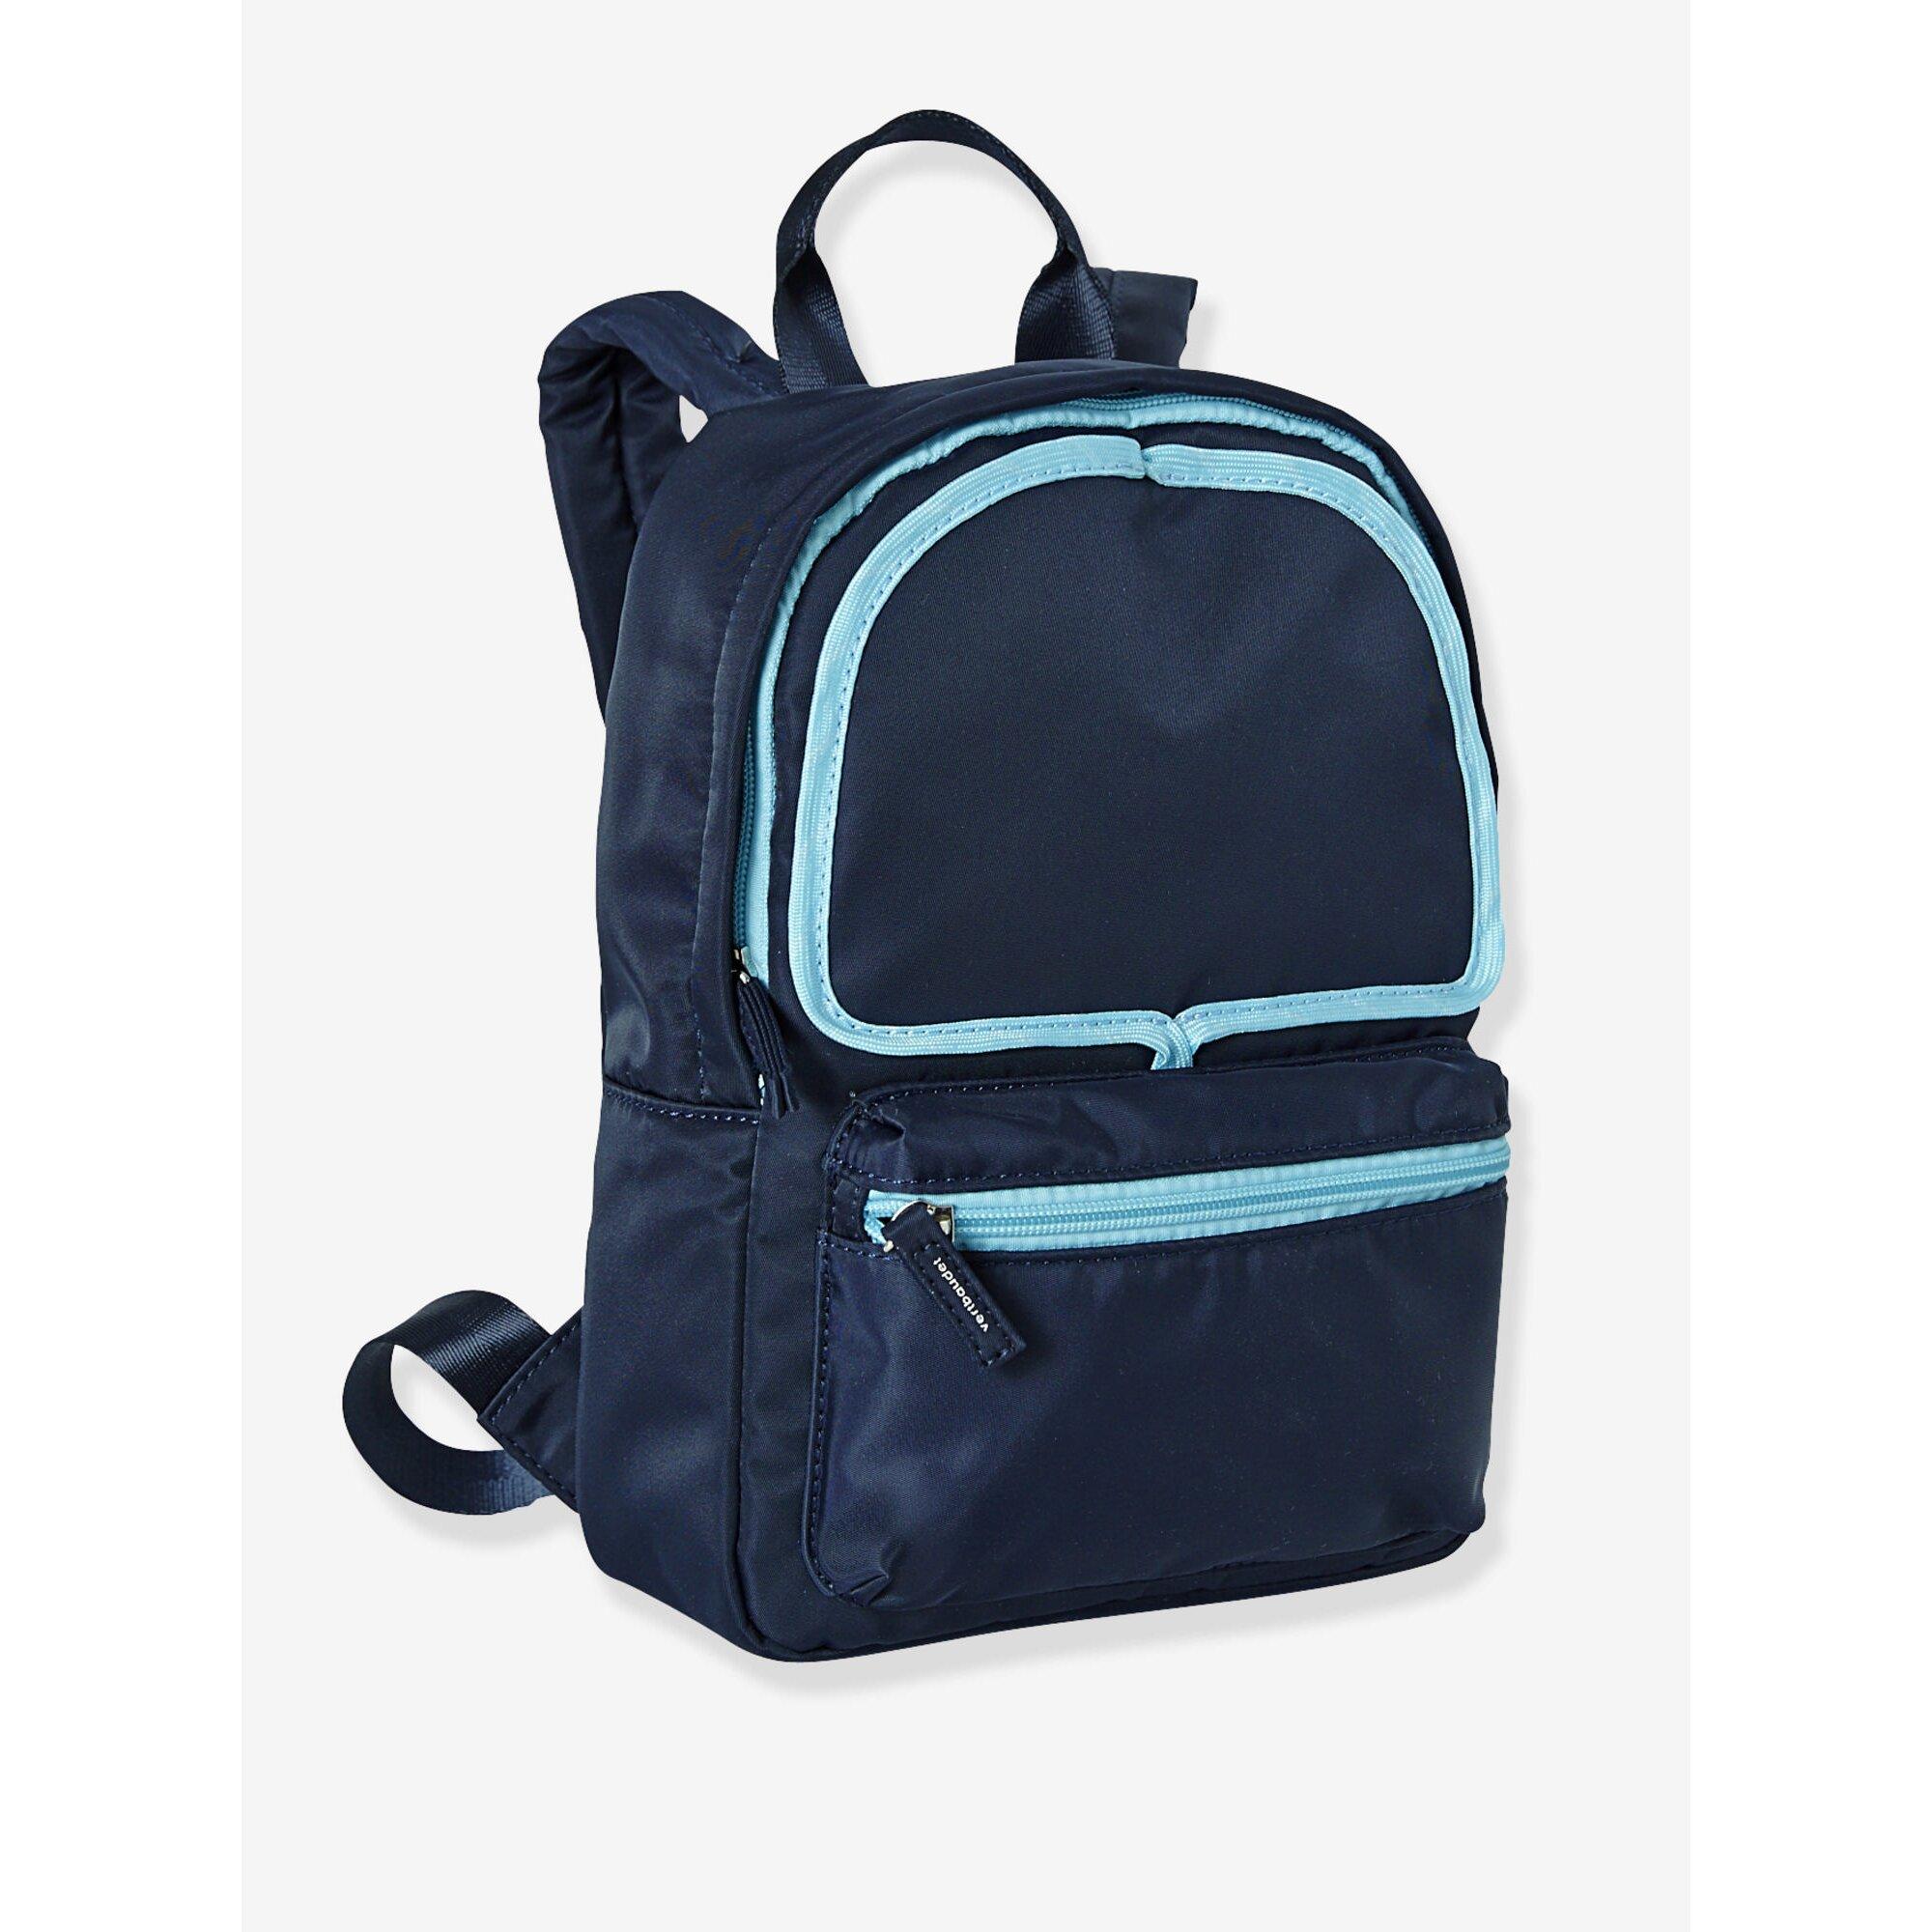 vertbaudet-rucksack-fur-jungen-beleuchtet, 30.99 EUR @ babywalz-de